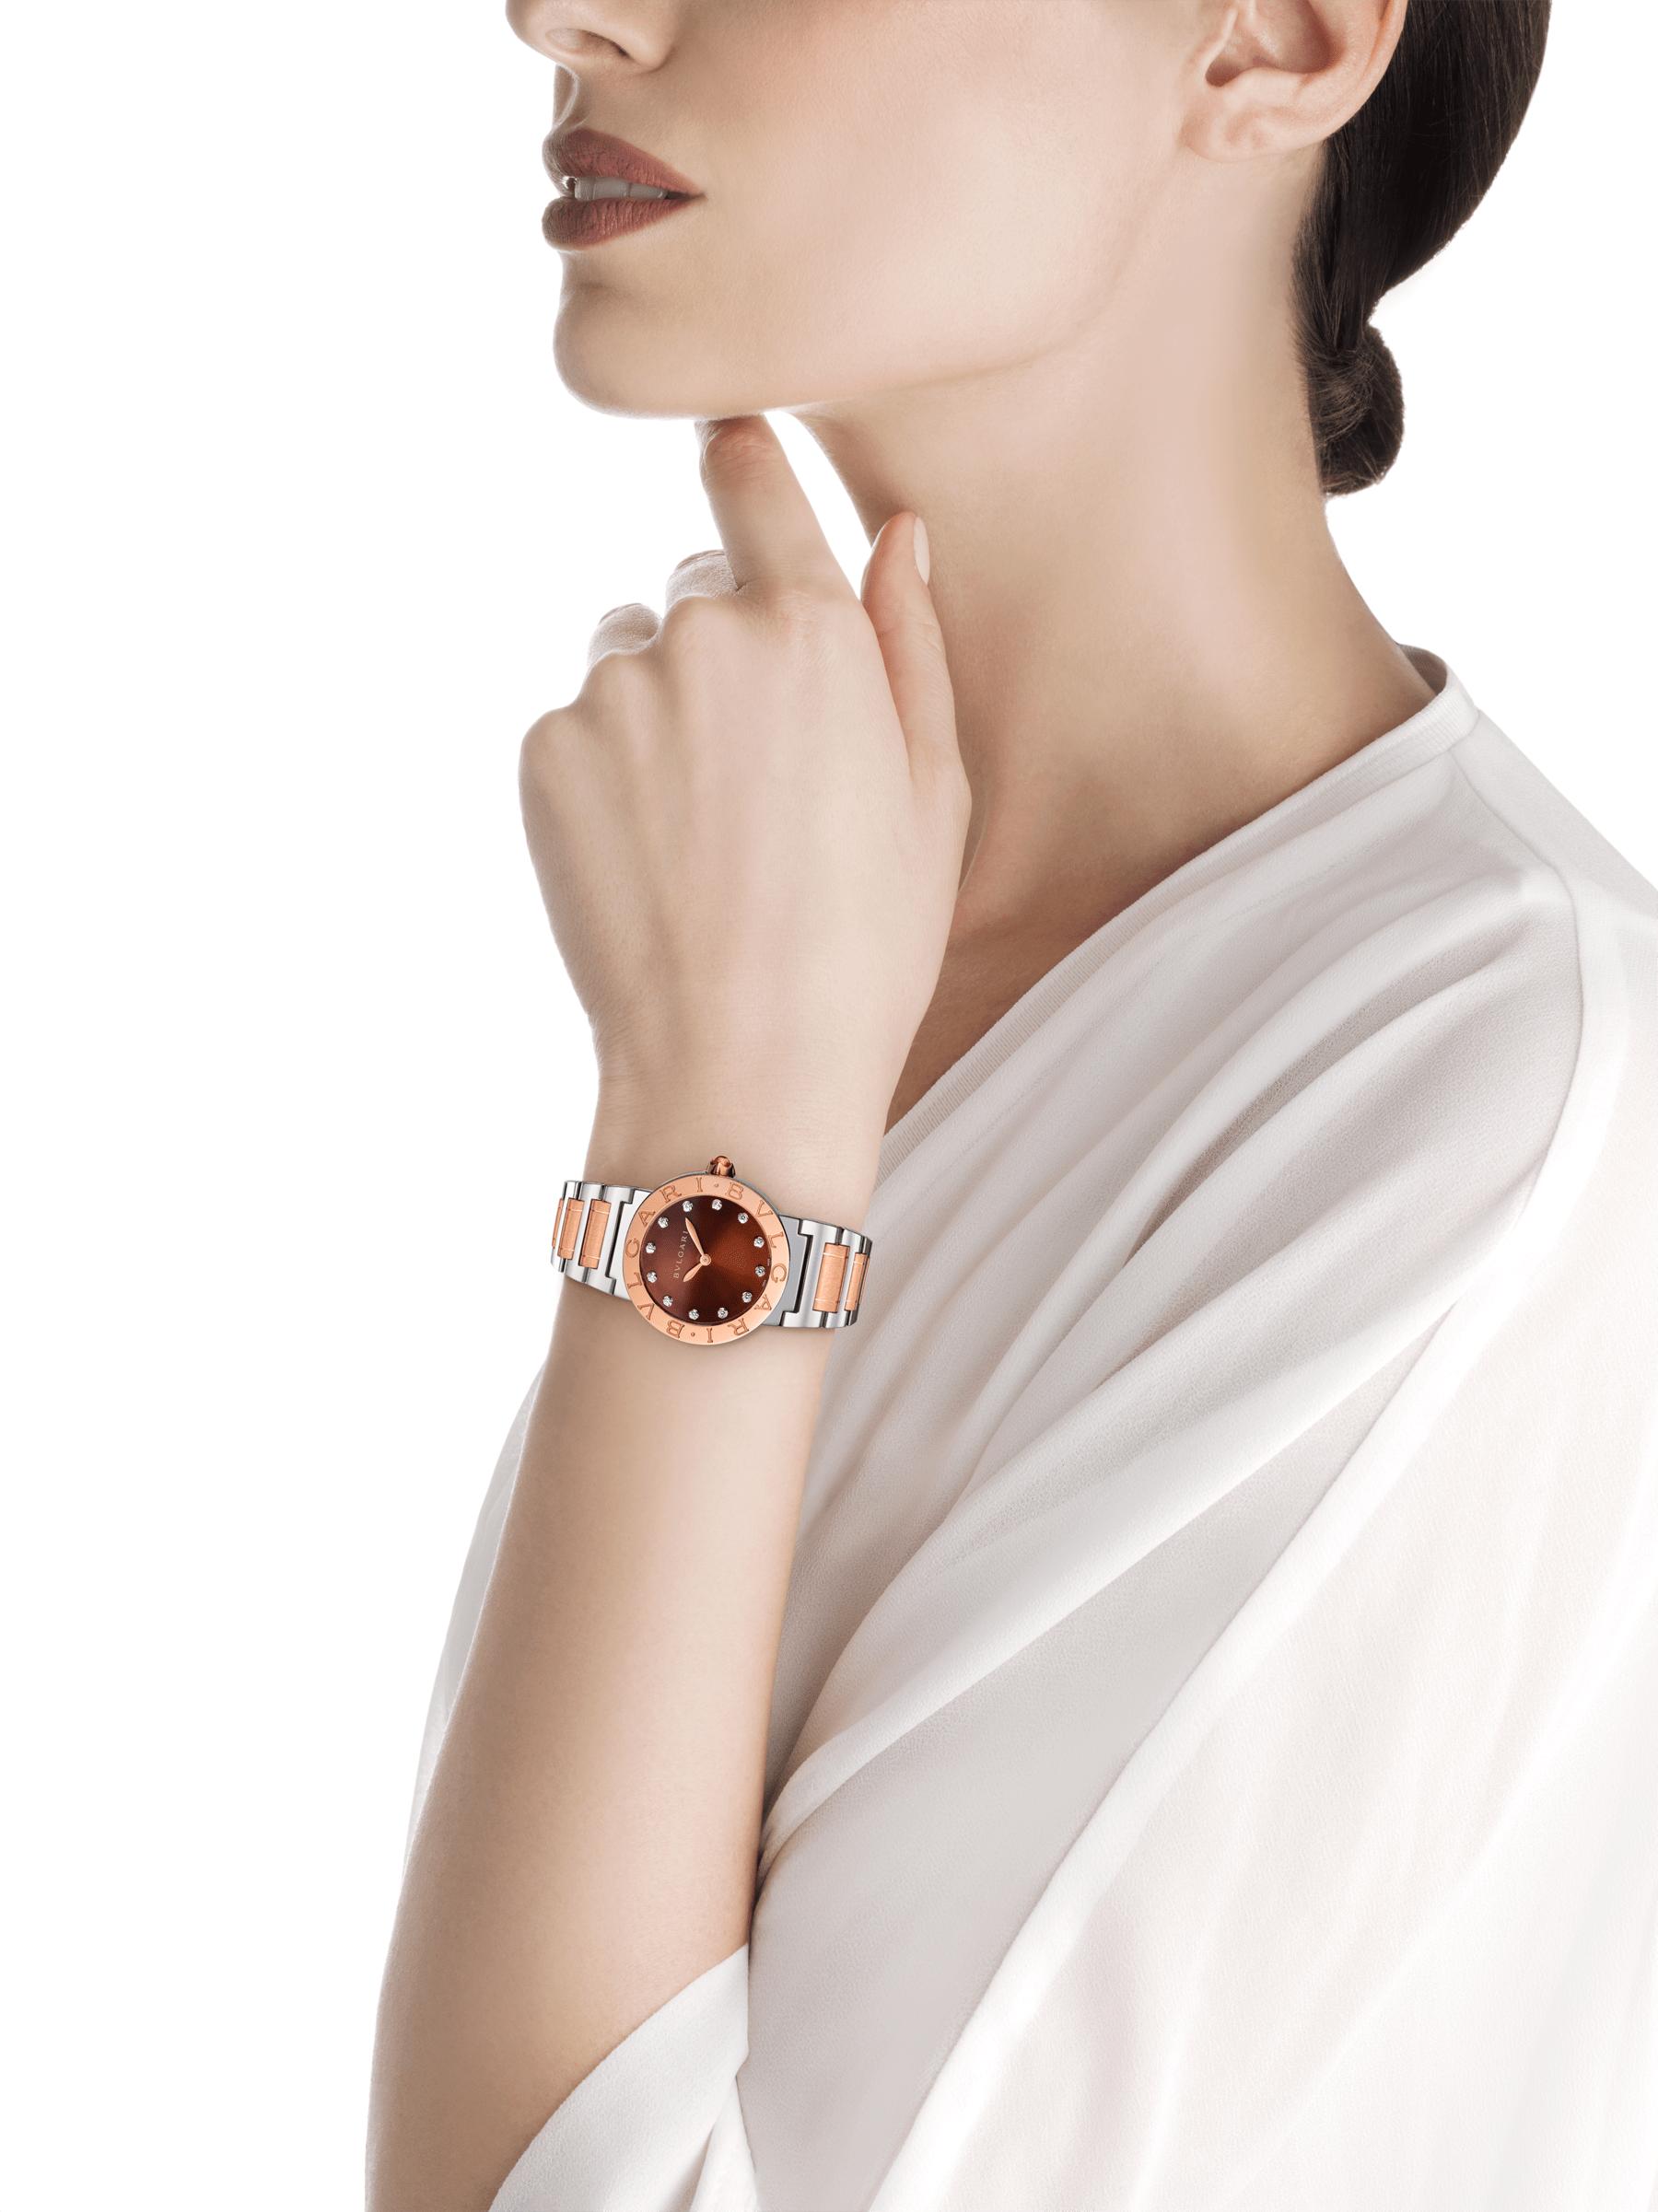 BVLGARI BVLGARI 腕錶,精鋼和 18K 玫瑰金錶殼和錶帶,棕色太陽紋漆面錶盤,鑽石時標。S 尺寸。 102155 image 4